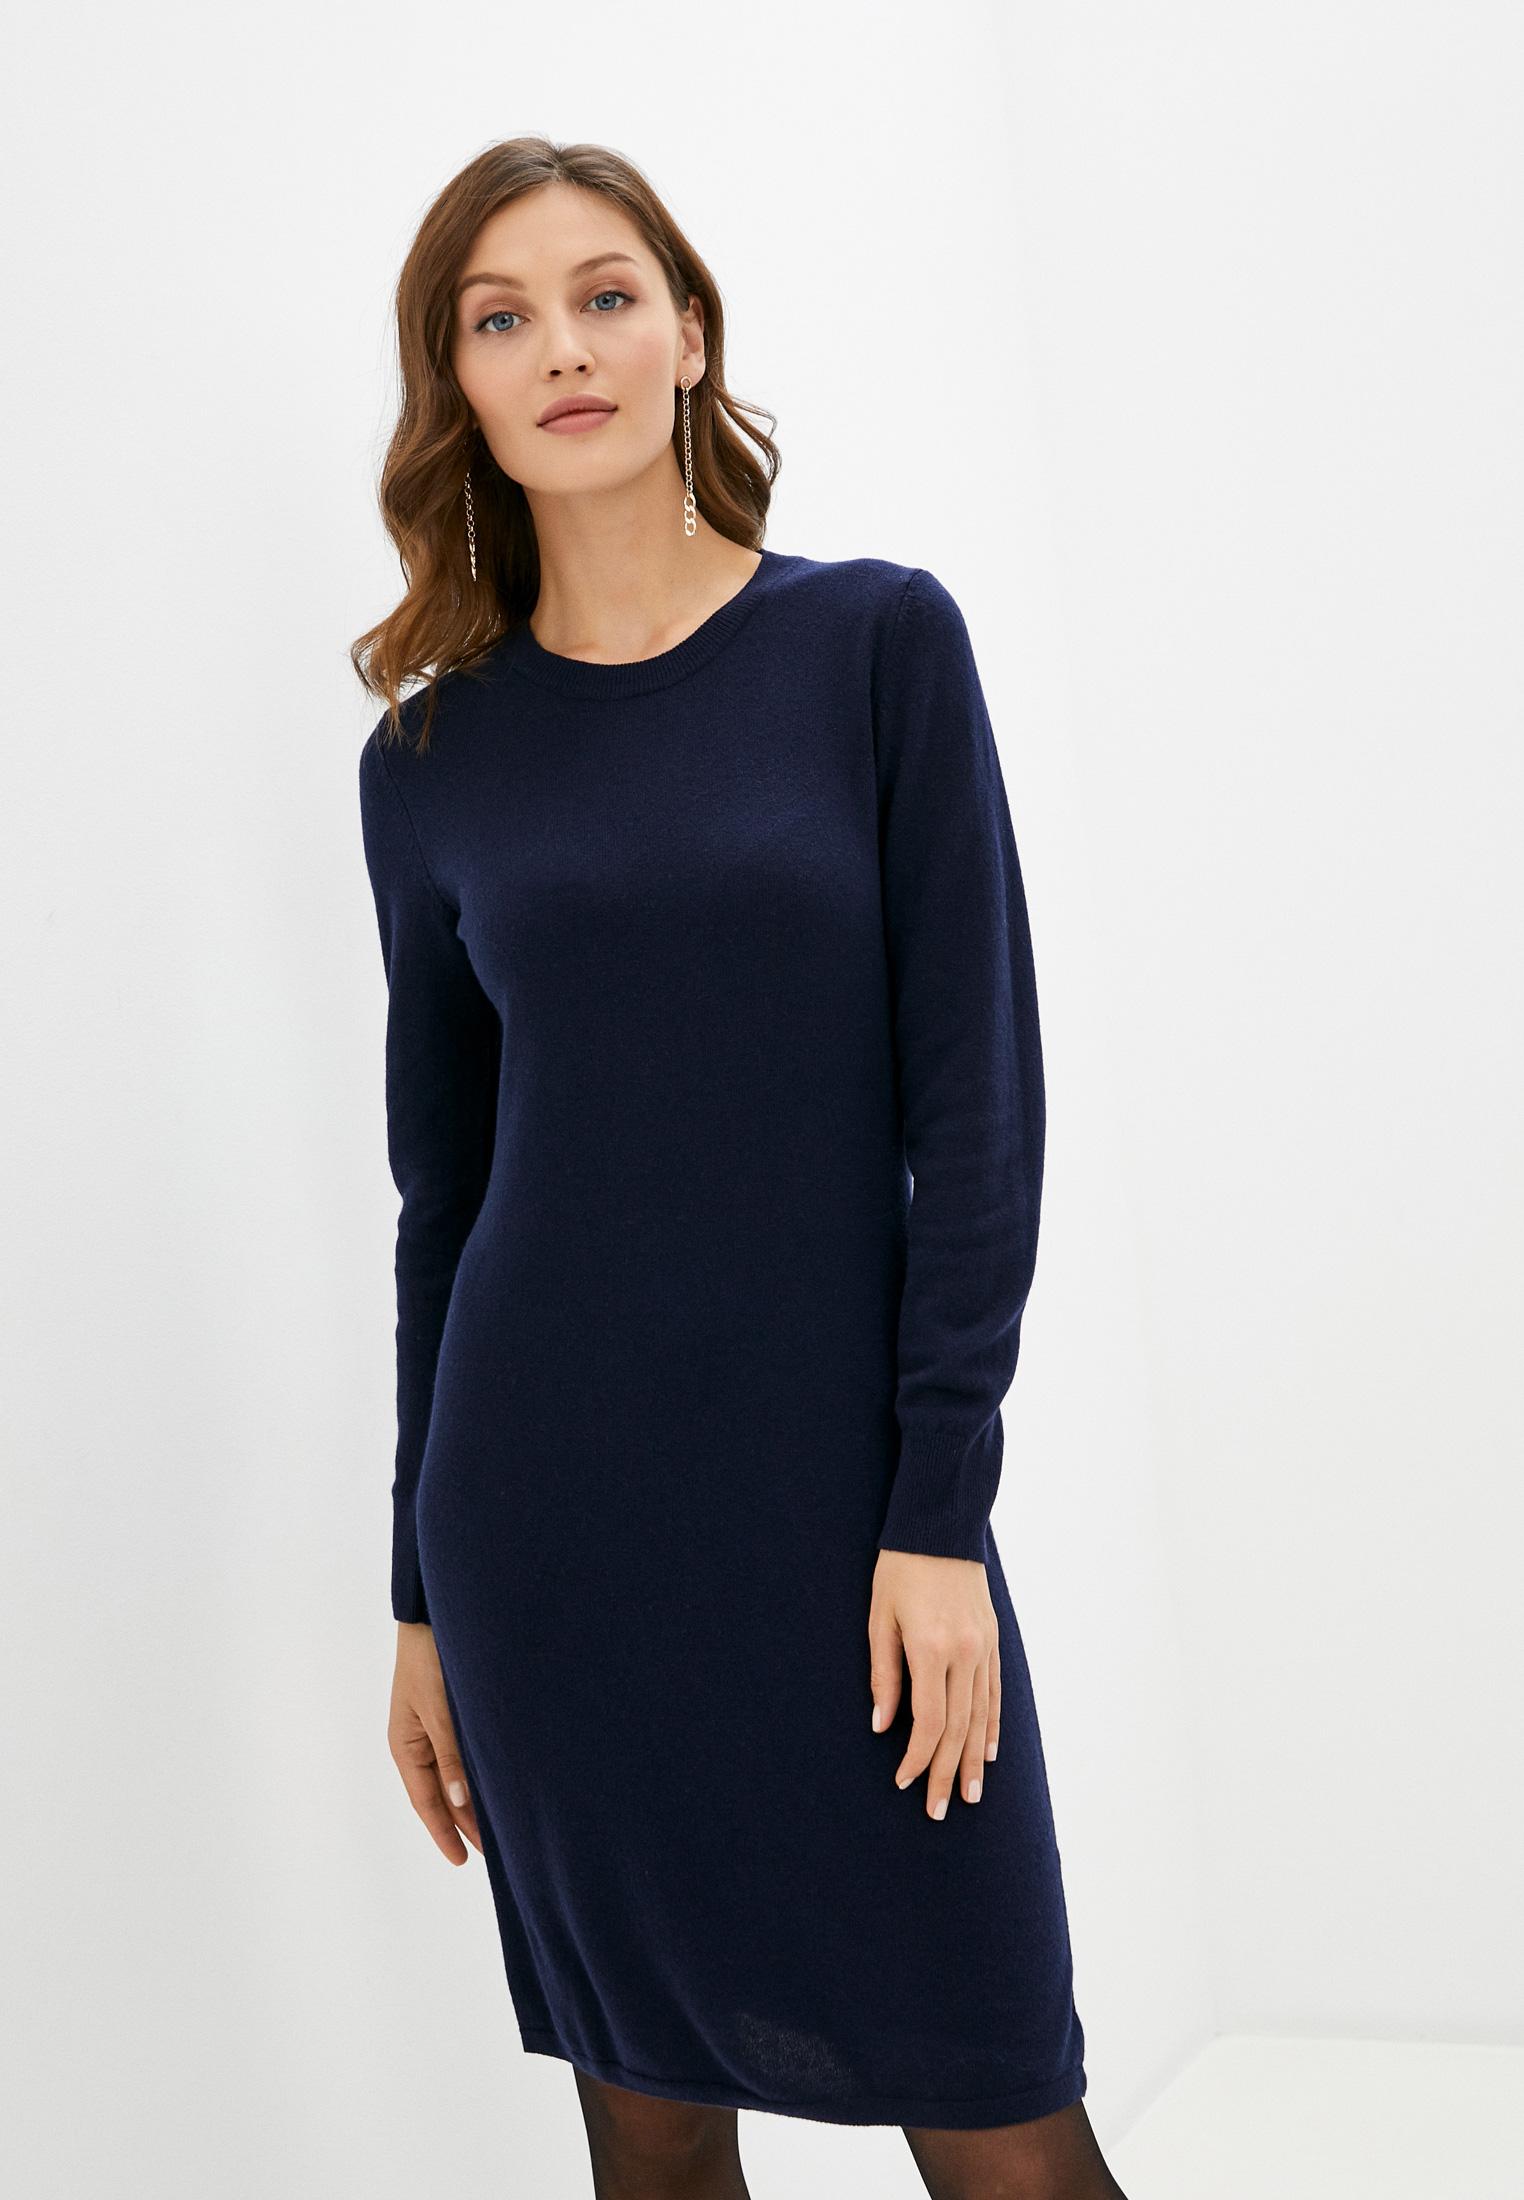 Вязаное платье United Colors of Benetton (Юнайтед Колорс оф Бенеттон) 1044V1N38